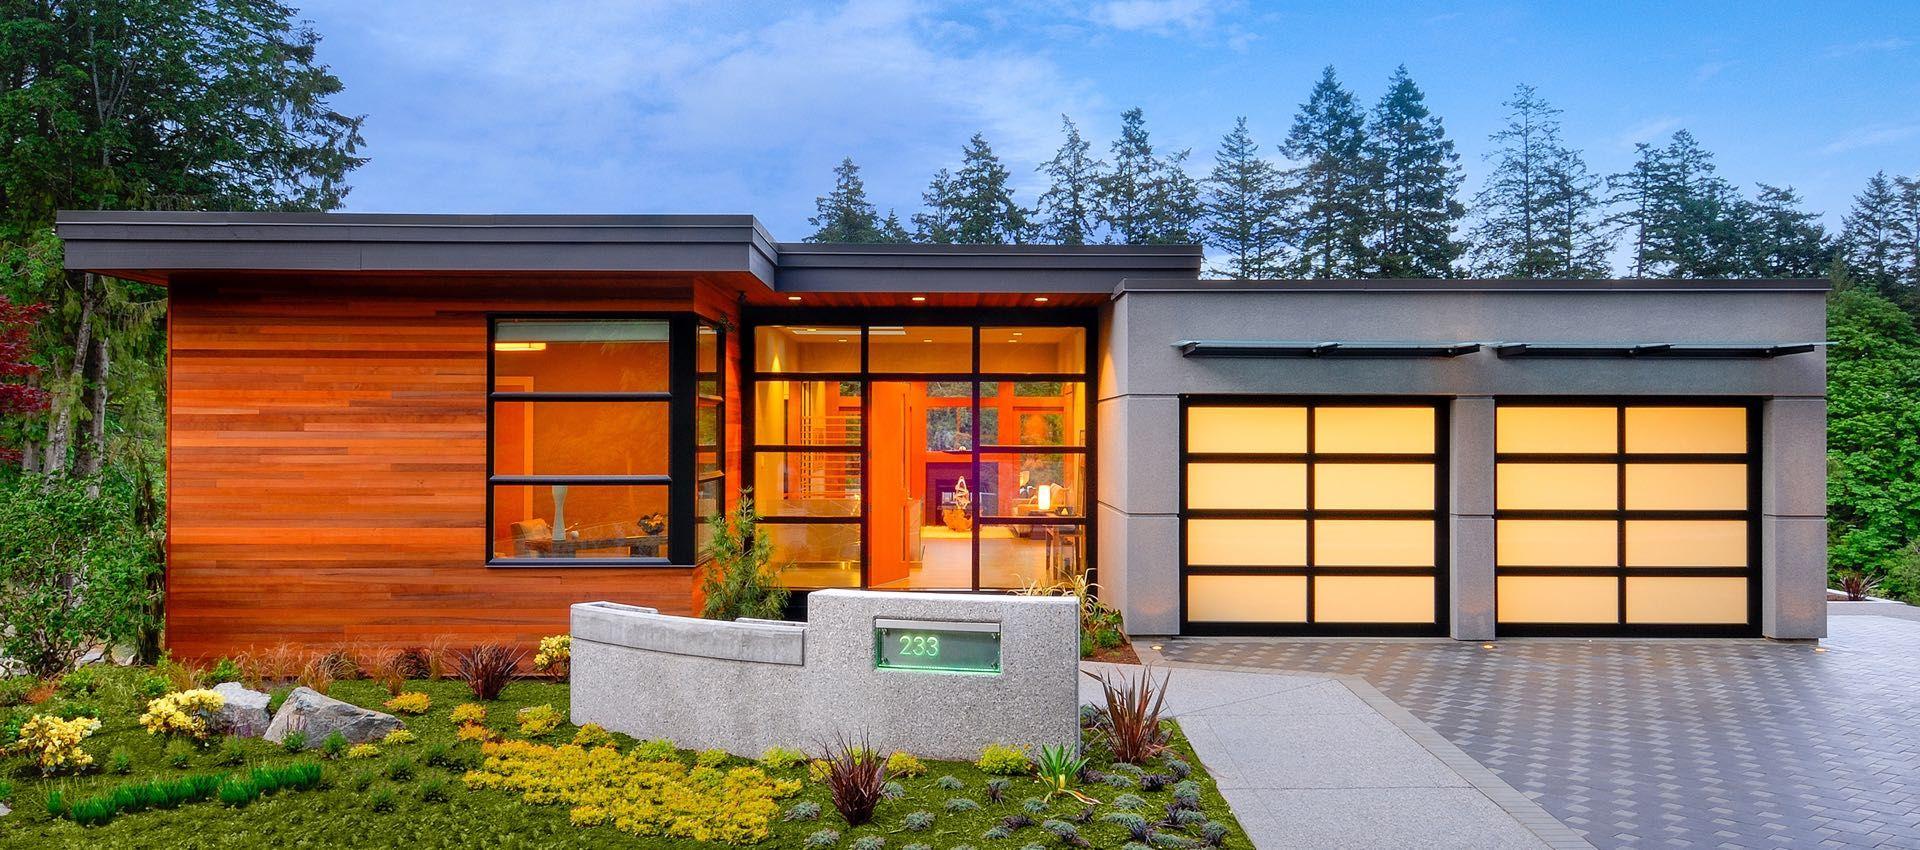 Christopher Developments Anya Lane West Coast Contemporary Luxury Home Contemporary House Contemporary House Design House Exterior